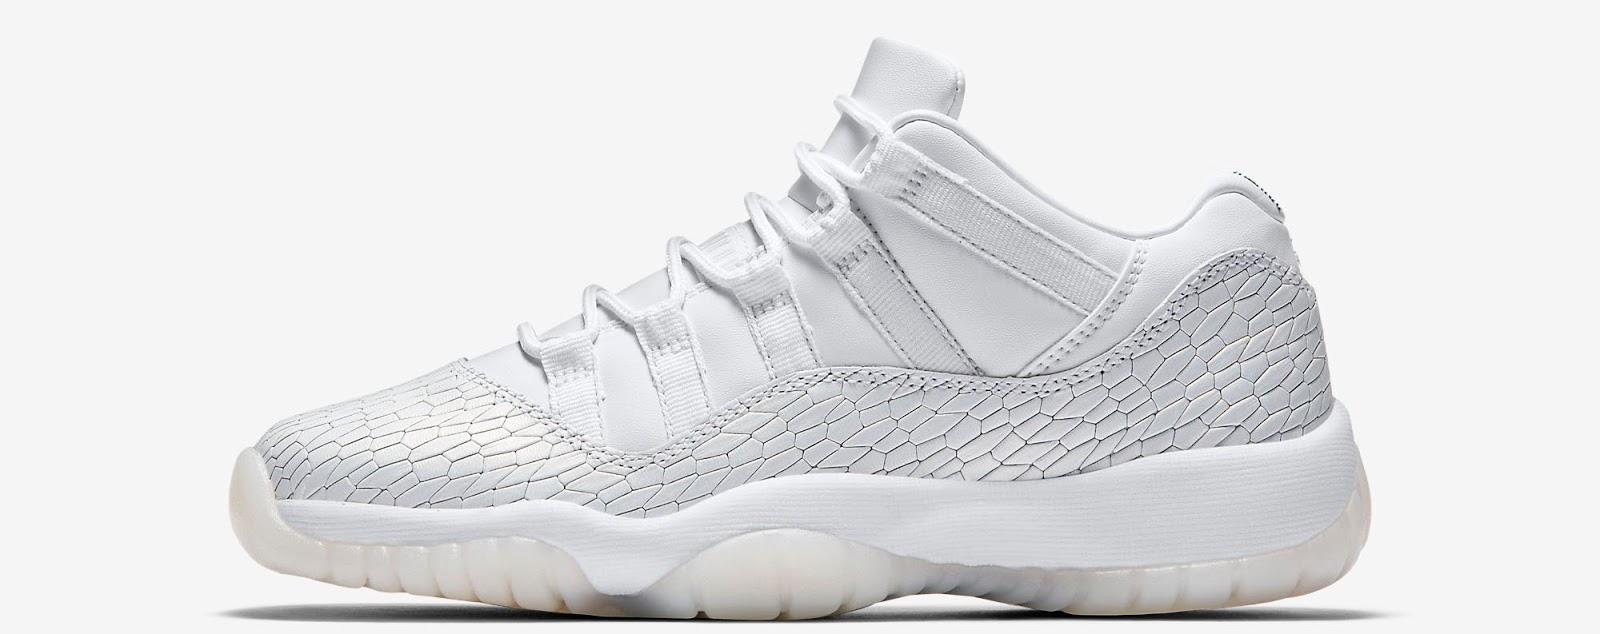 7c5a44e65fe302 ajordanxi Your  1 Source For Sneaker Release Dates  Girls Air Jordan ...